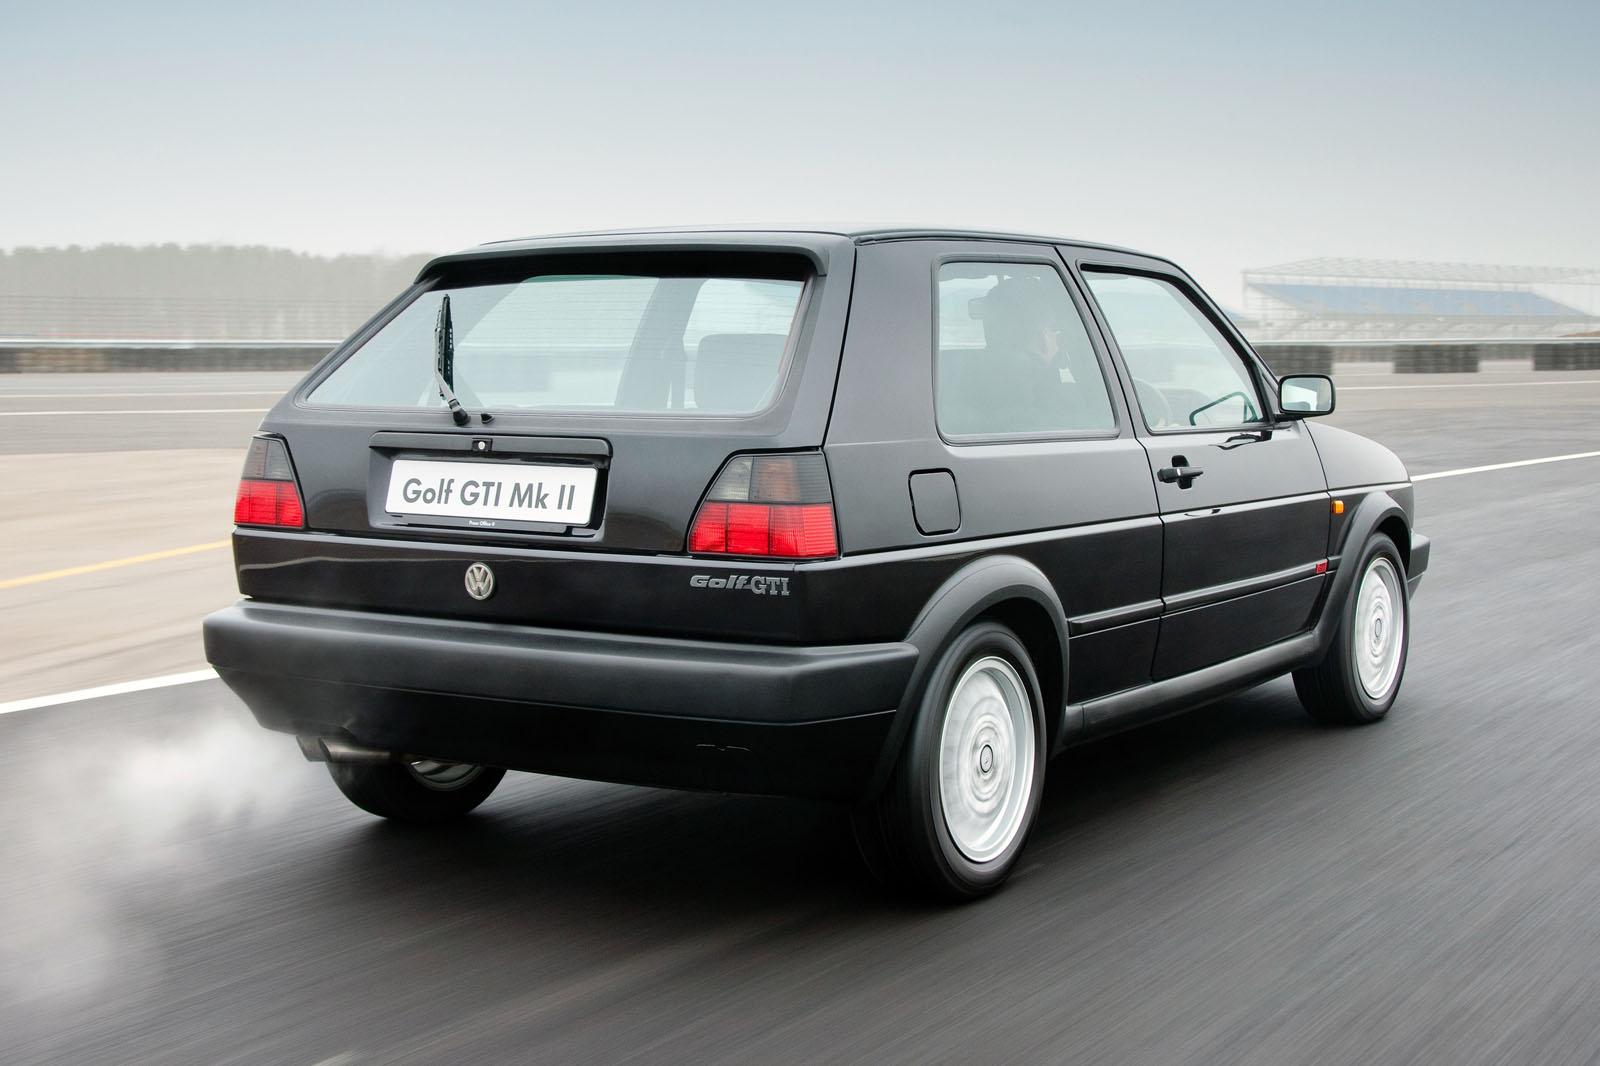 Used Car Buying Guide Volkswagen Golf Gti Mk2 Autocar